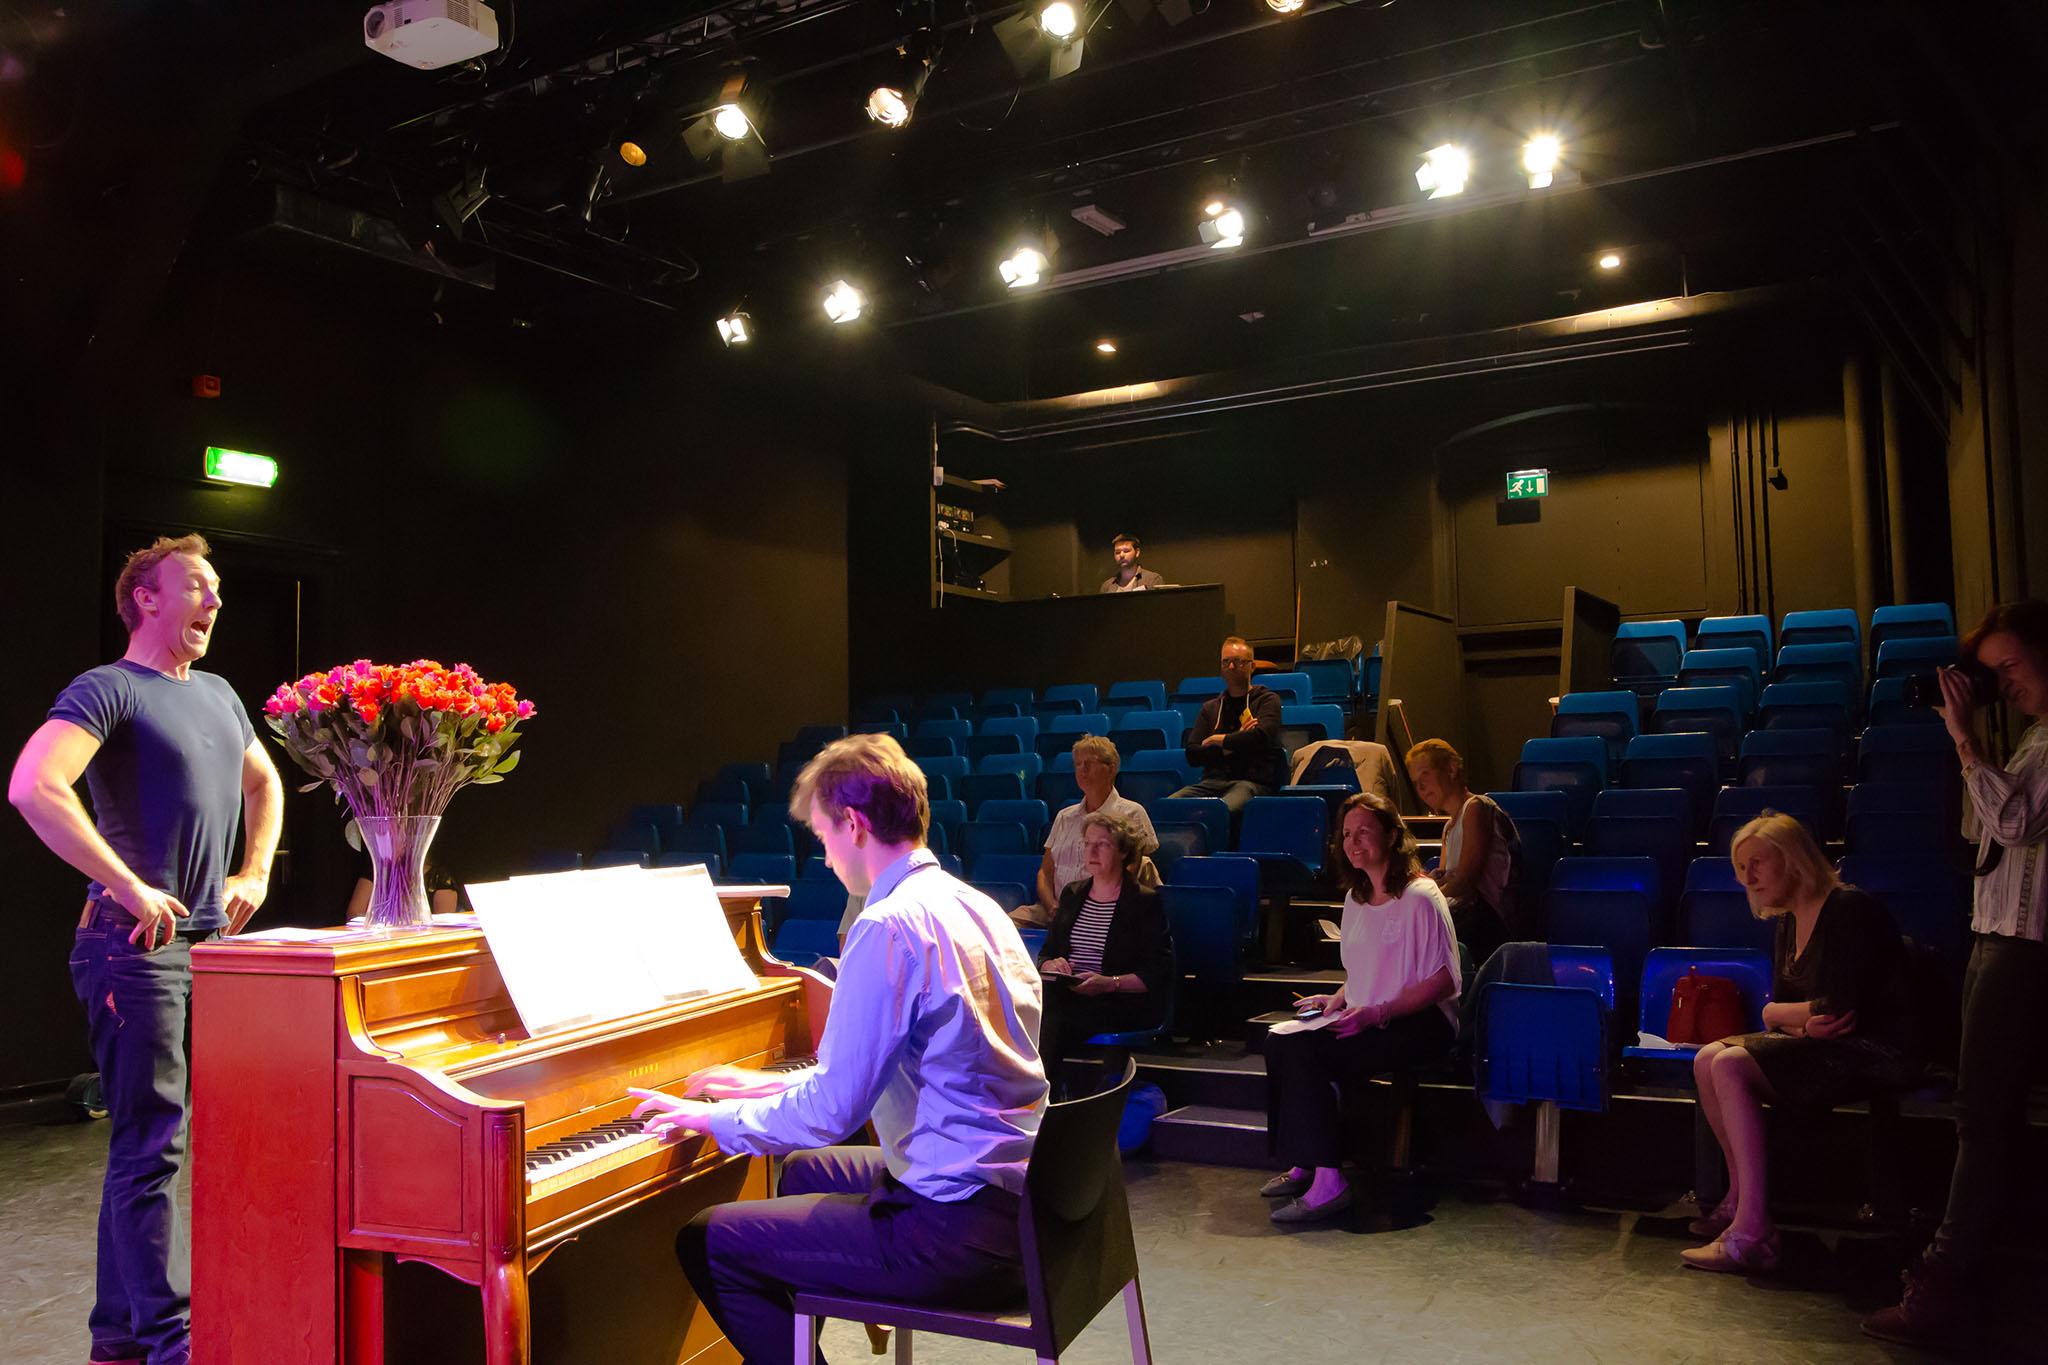 ZIMIHC theater bedrijfsfotografie Wittevrouwen podium